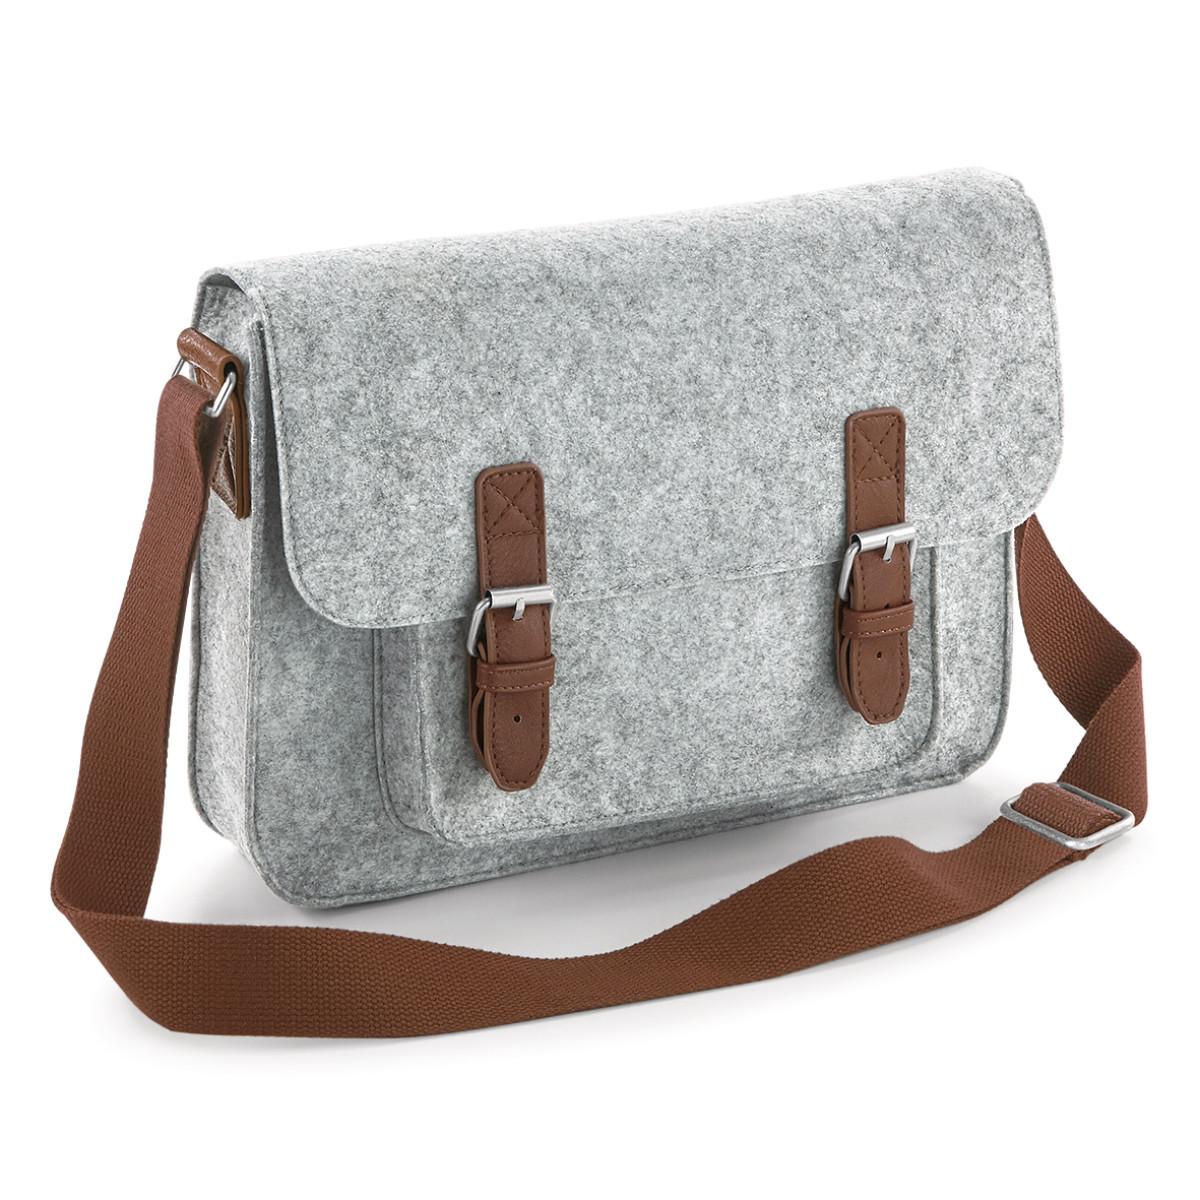 Bagbase Premium Felt Satchel